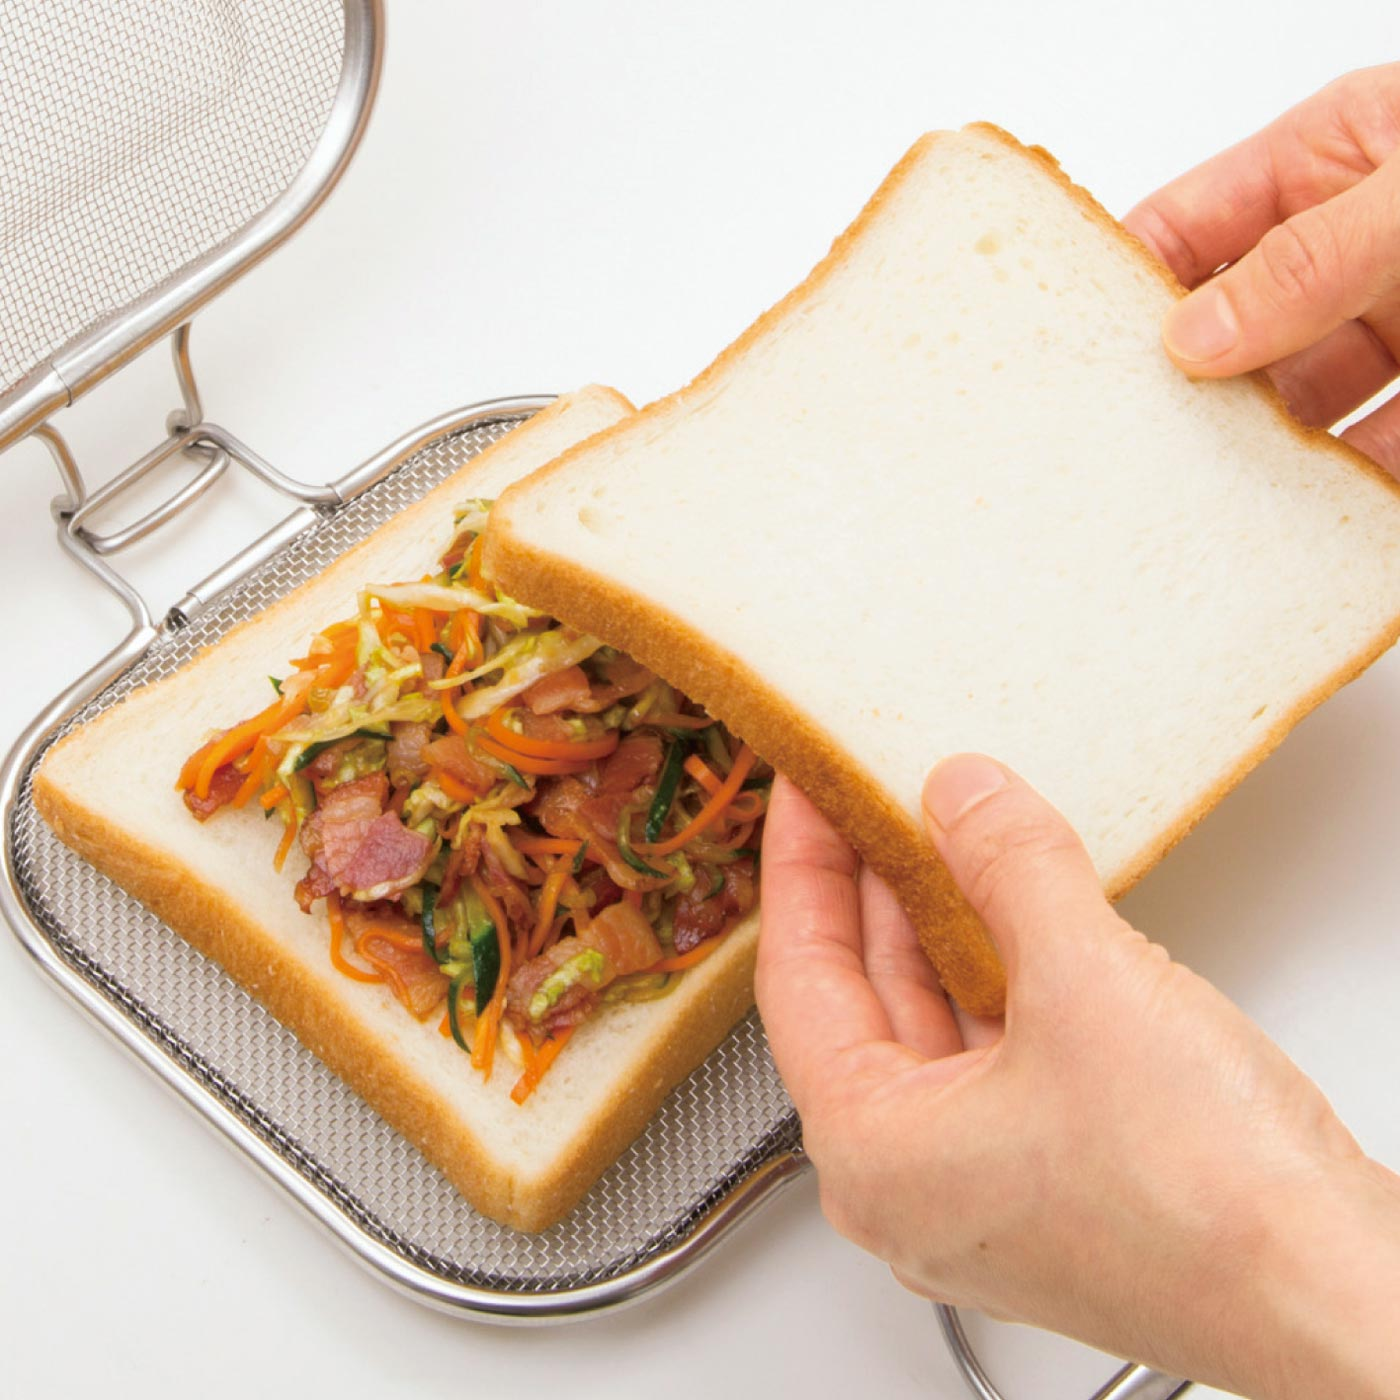 HOW TO USE① お好みの具材をパンに挟んで。